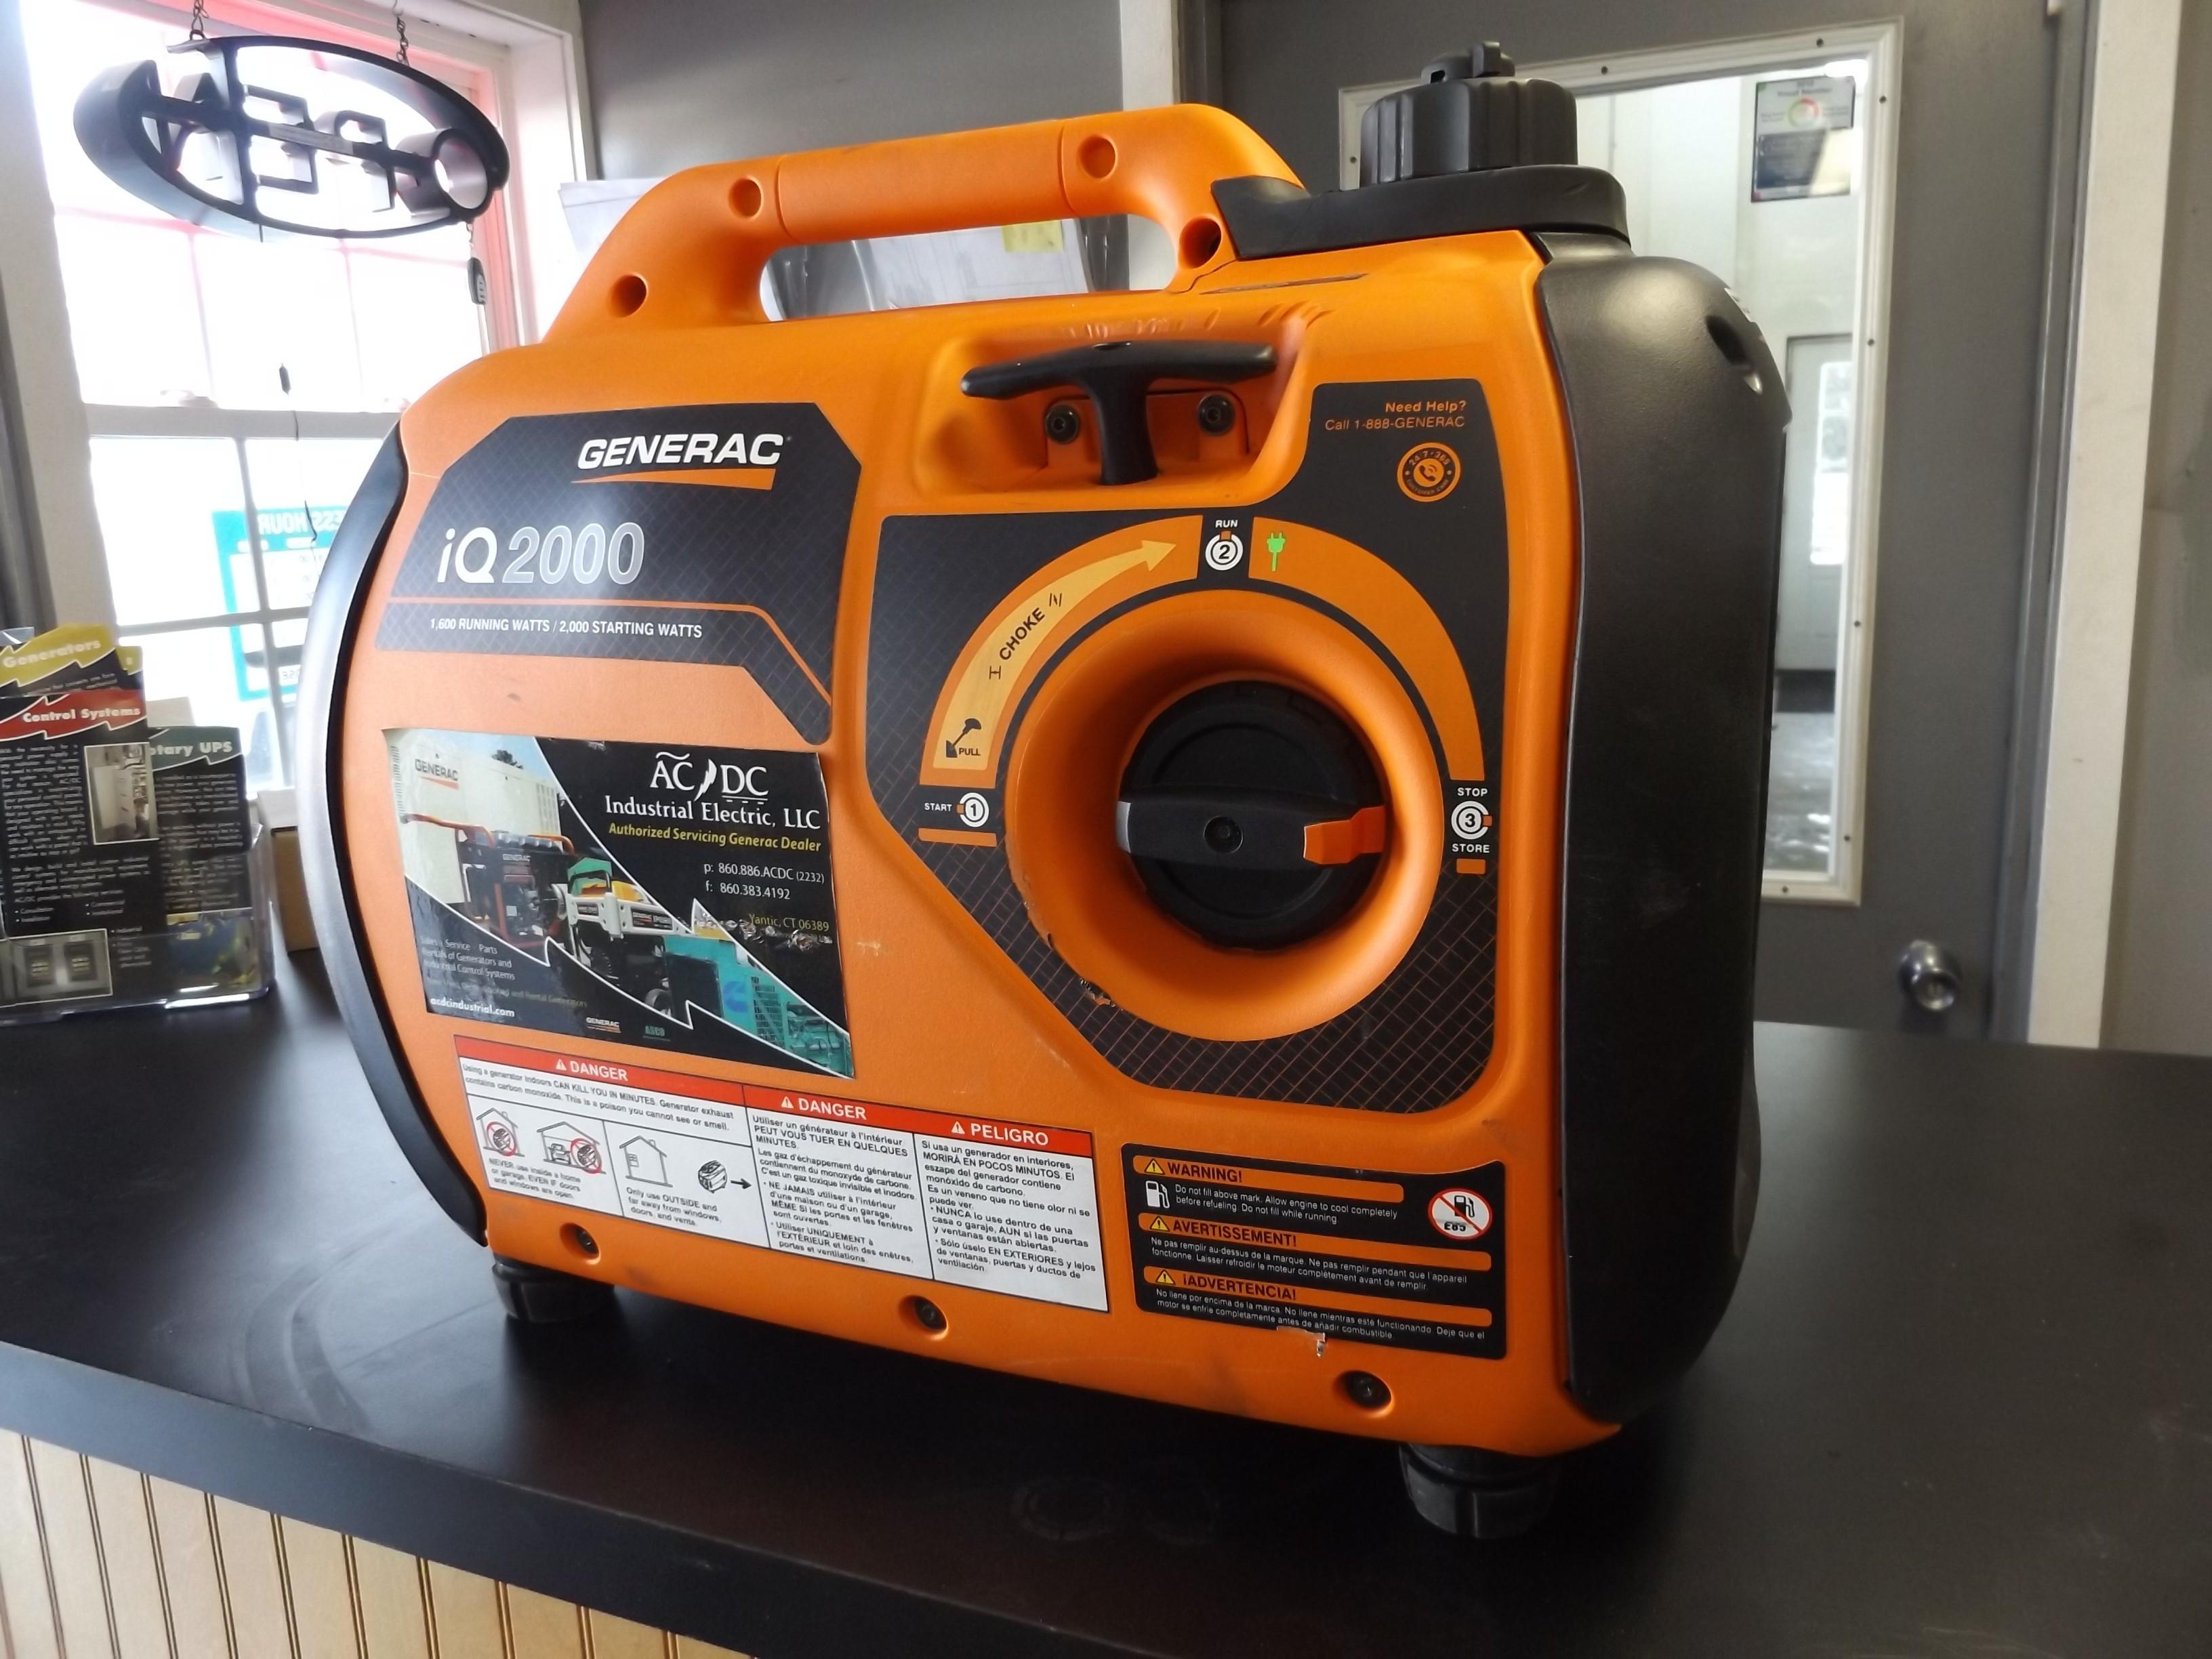 iQ2000 Portable Inverter Generator